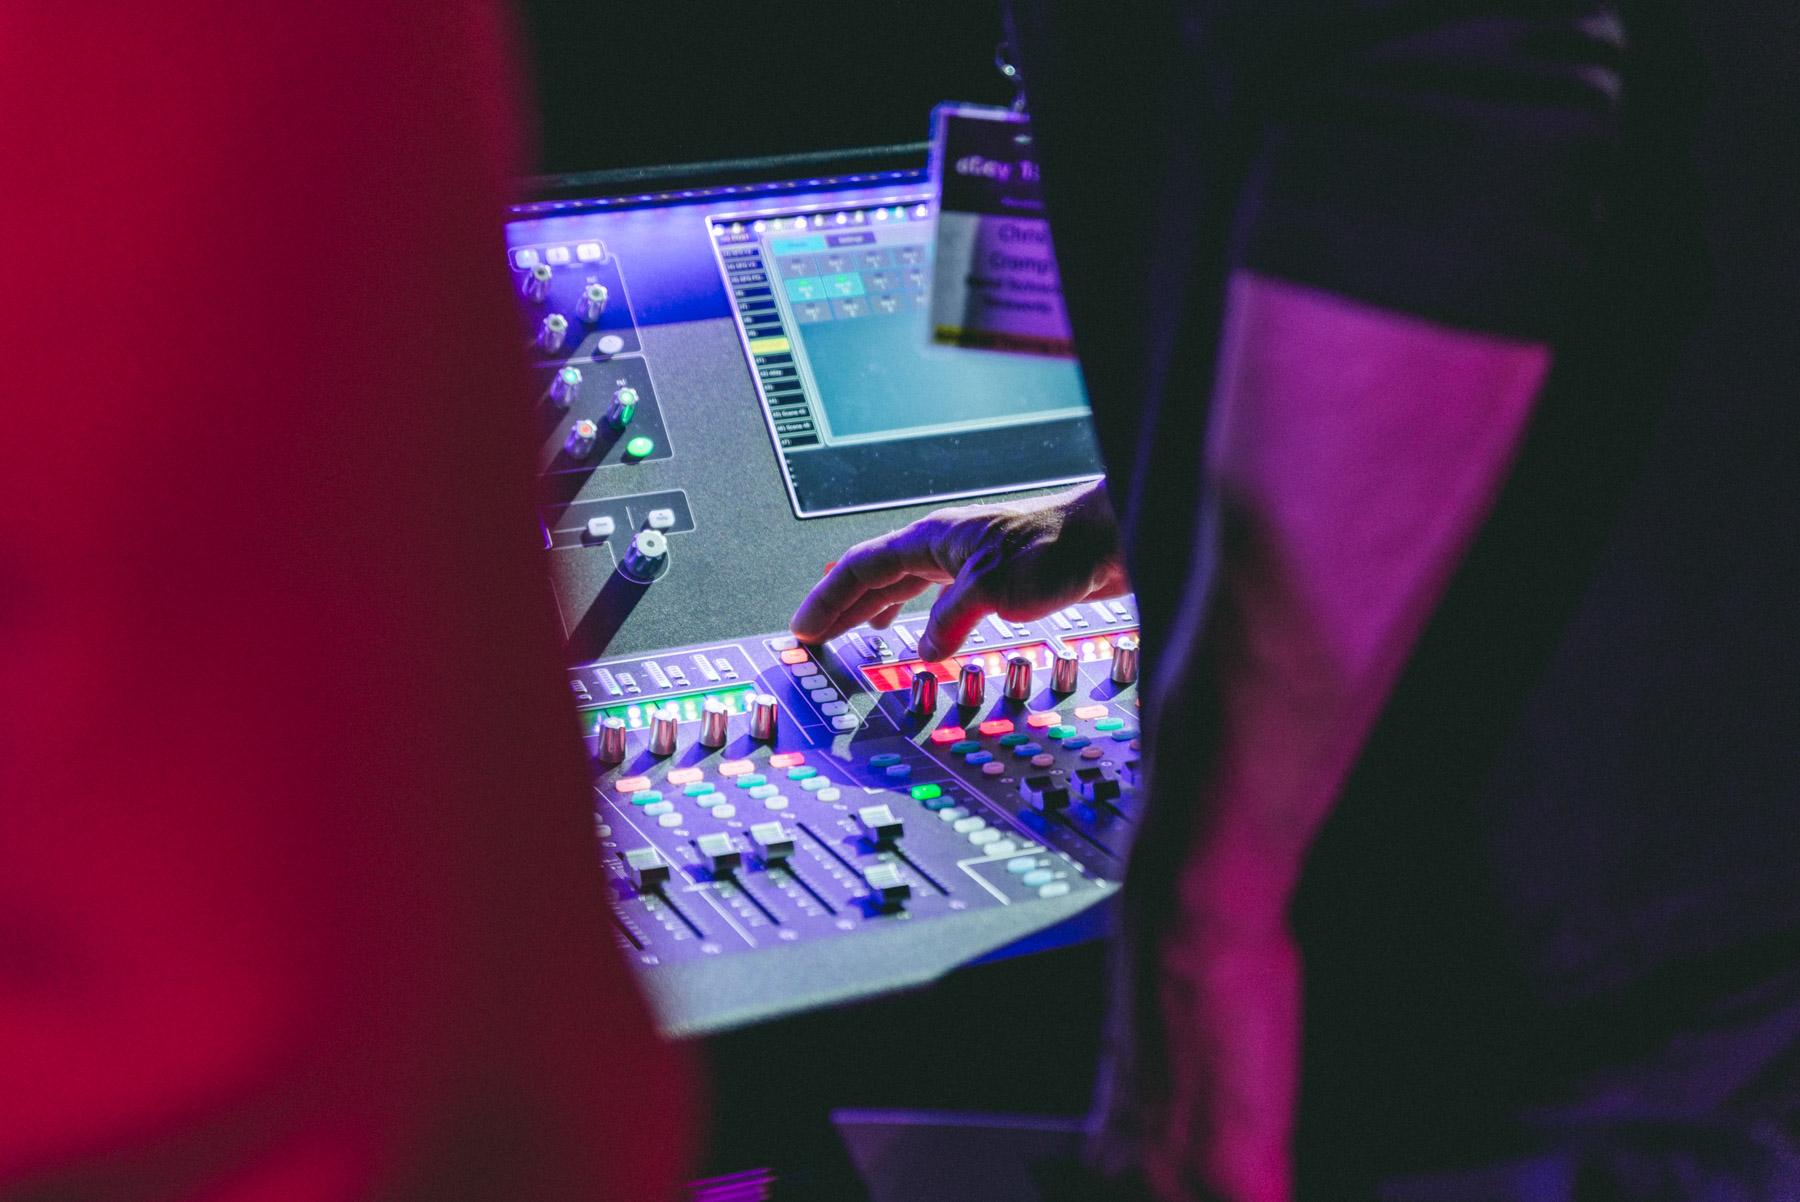 f1-sound-company-02.jpg